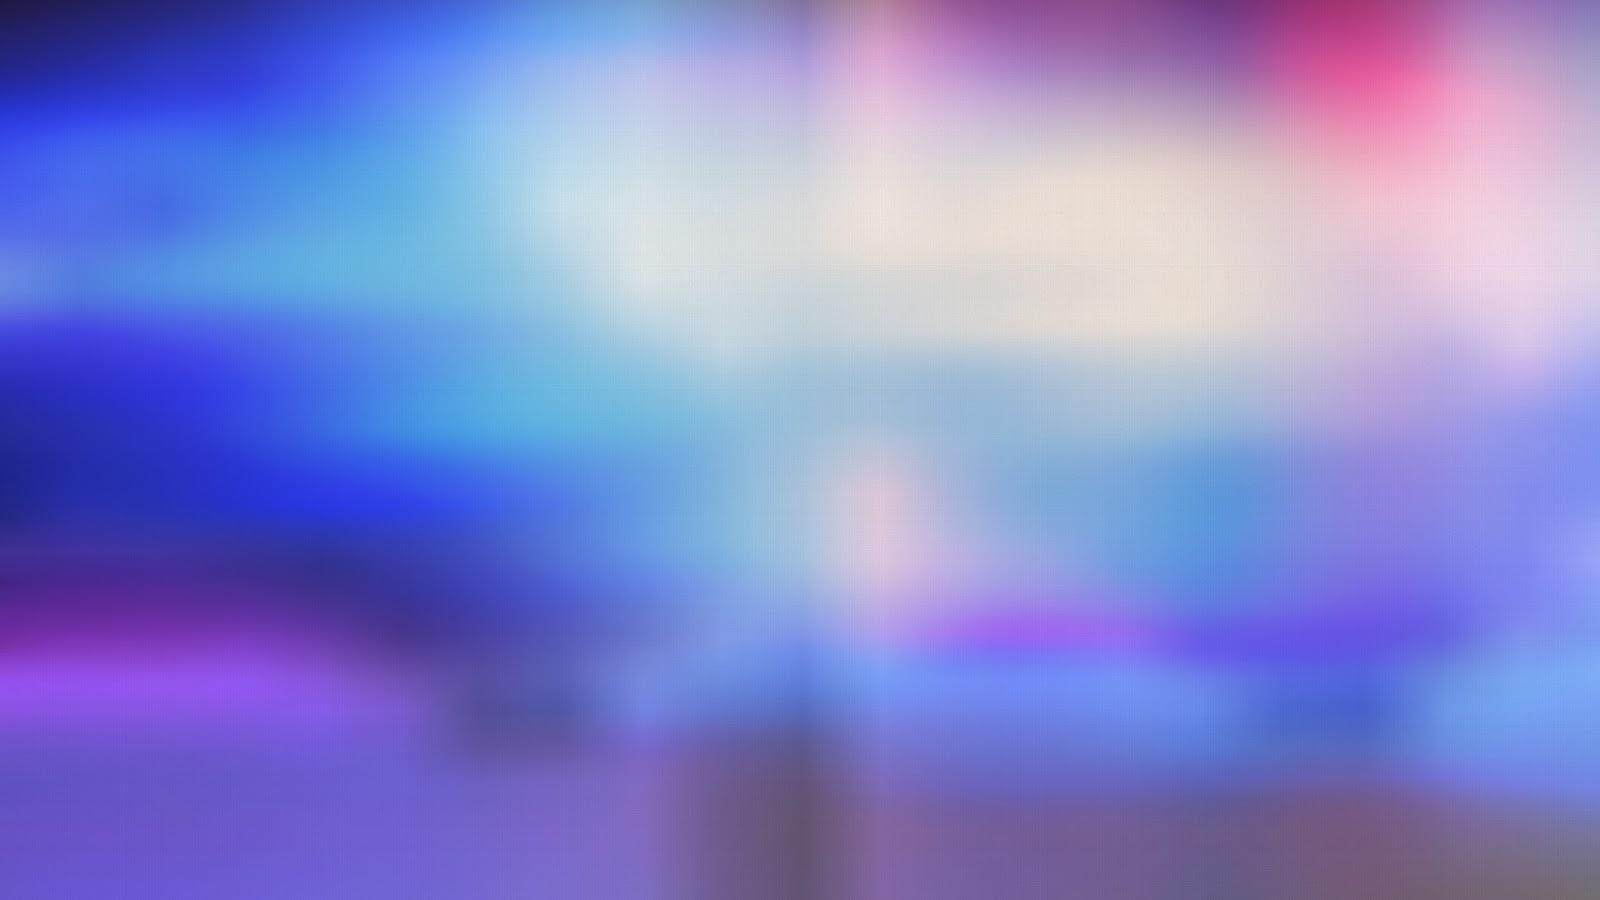 Fondo de pantalla abstracto imagen desenfocada for Imagenes hd para fondo